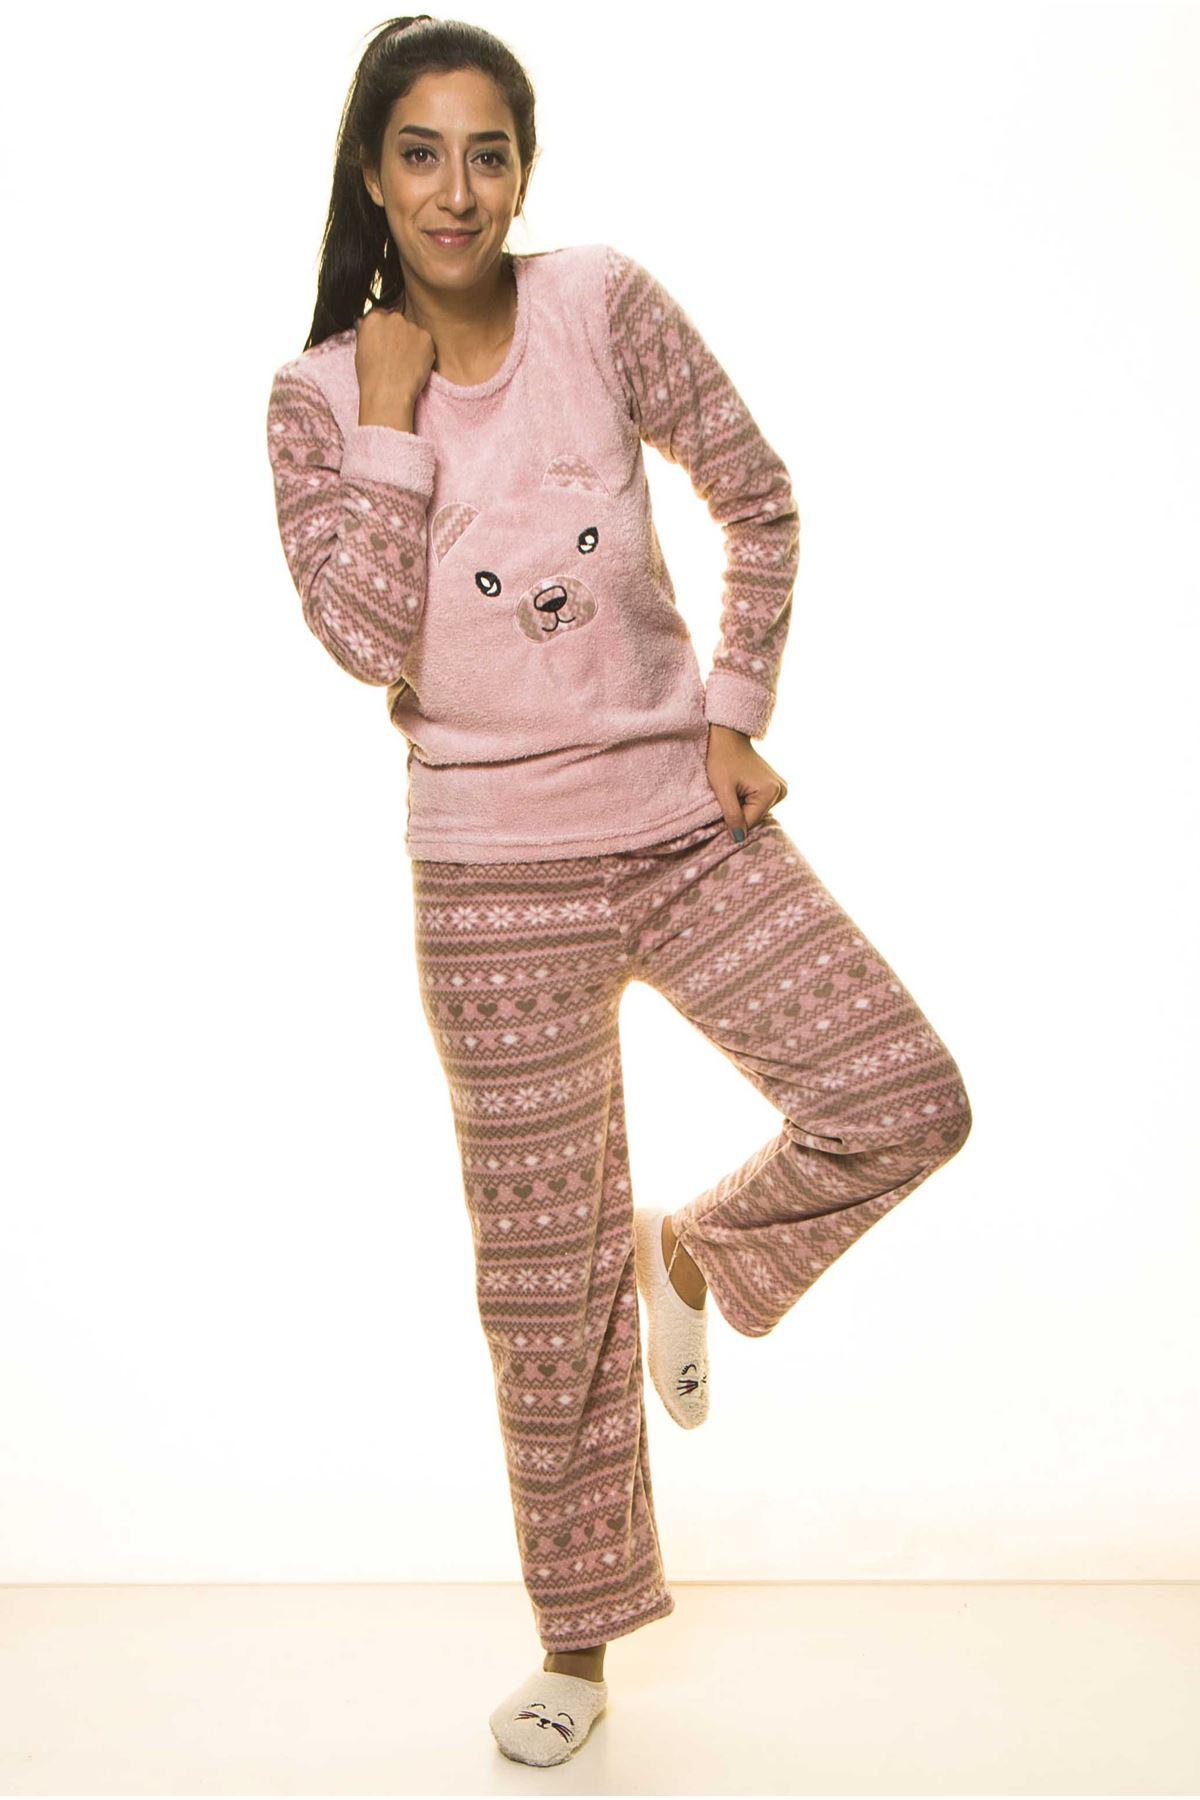 Pembe Kışlık Sevimli Welsoft Peluş Pijama 1C-2058